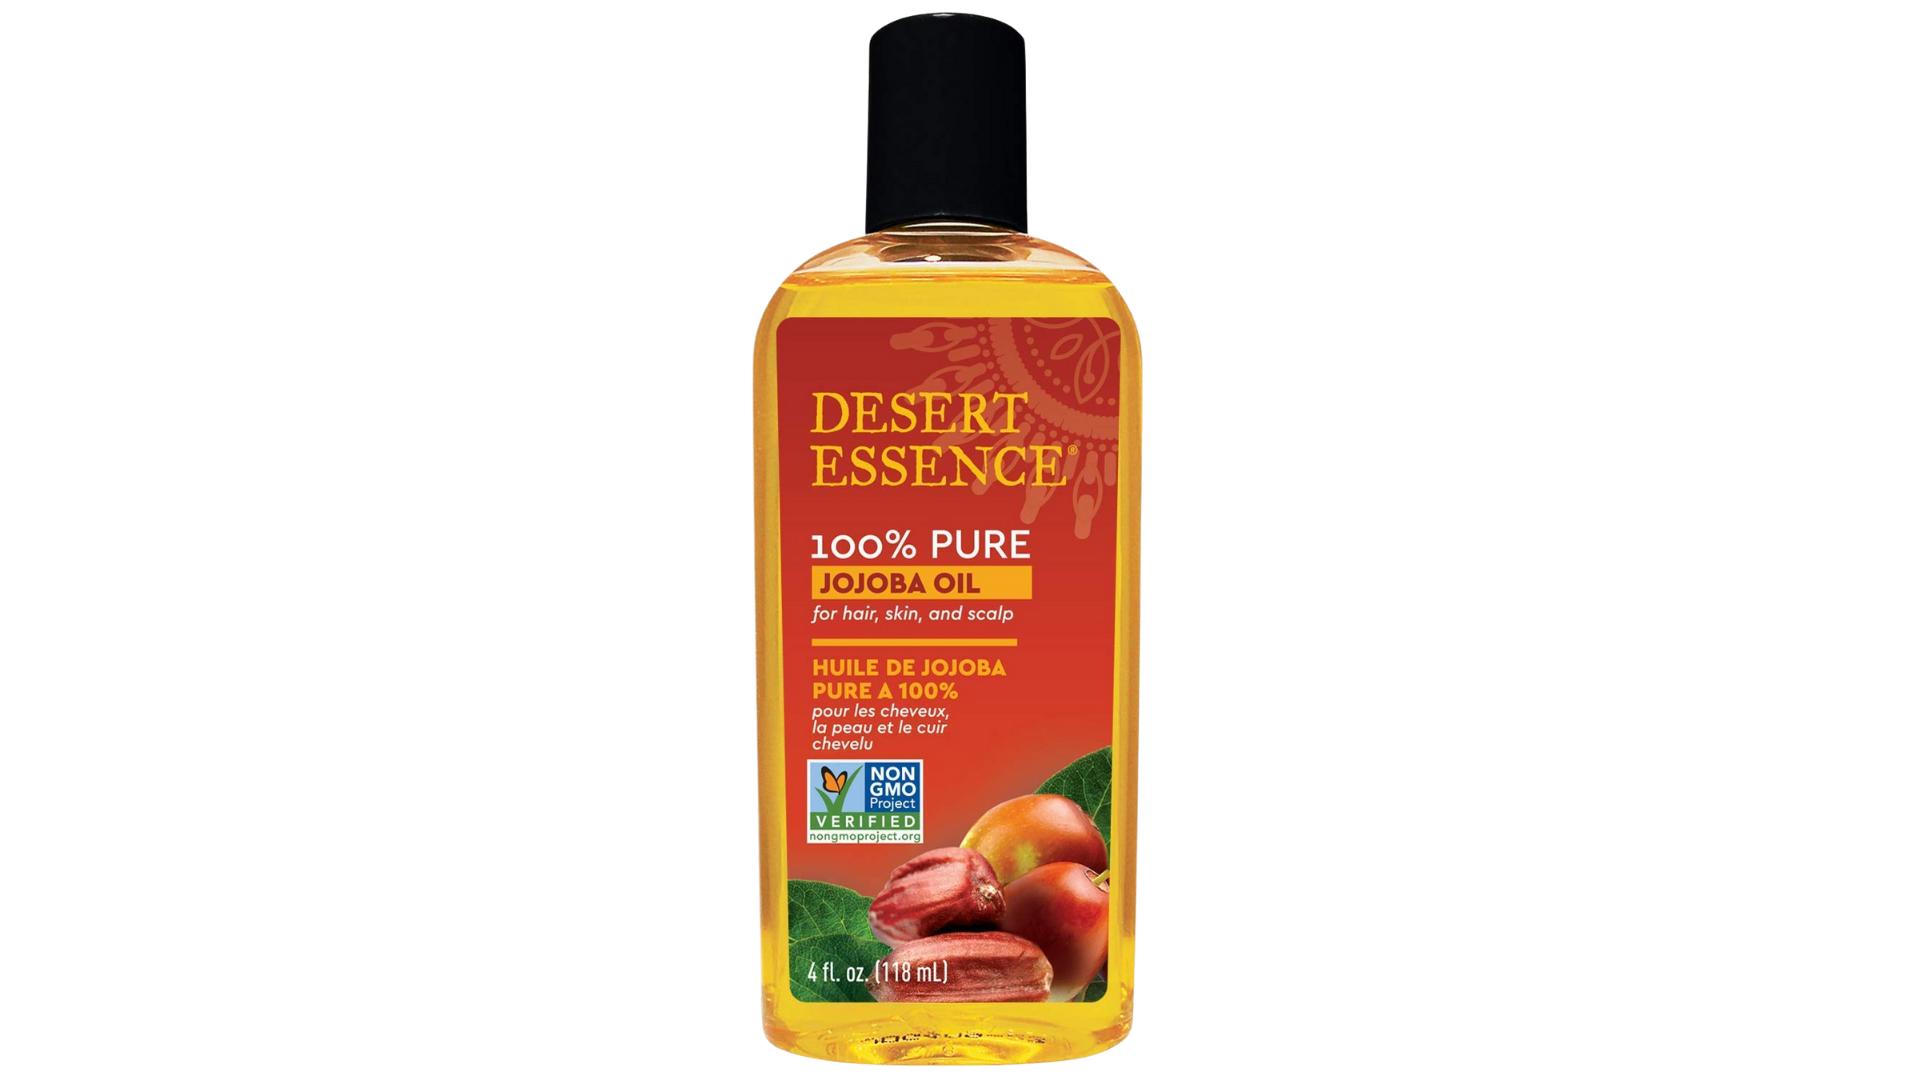 Desert Essence 100% Pure Jojoba Oil skin and hair